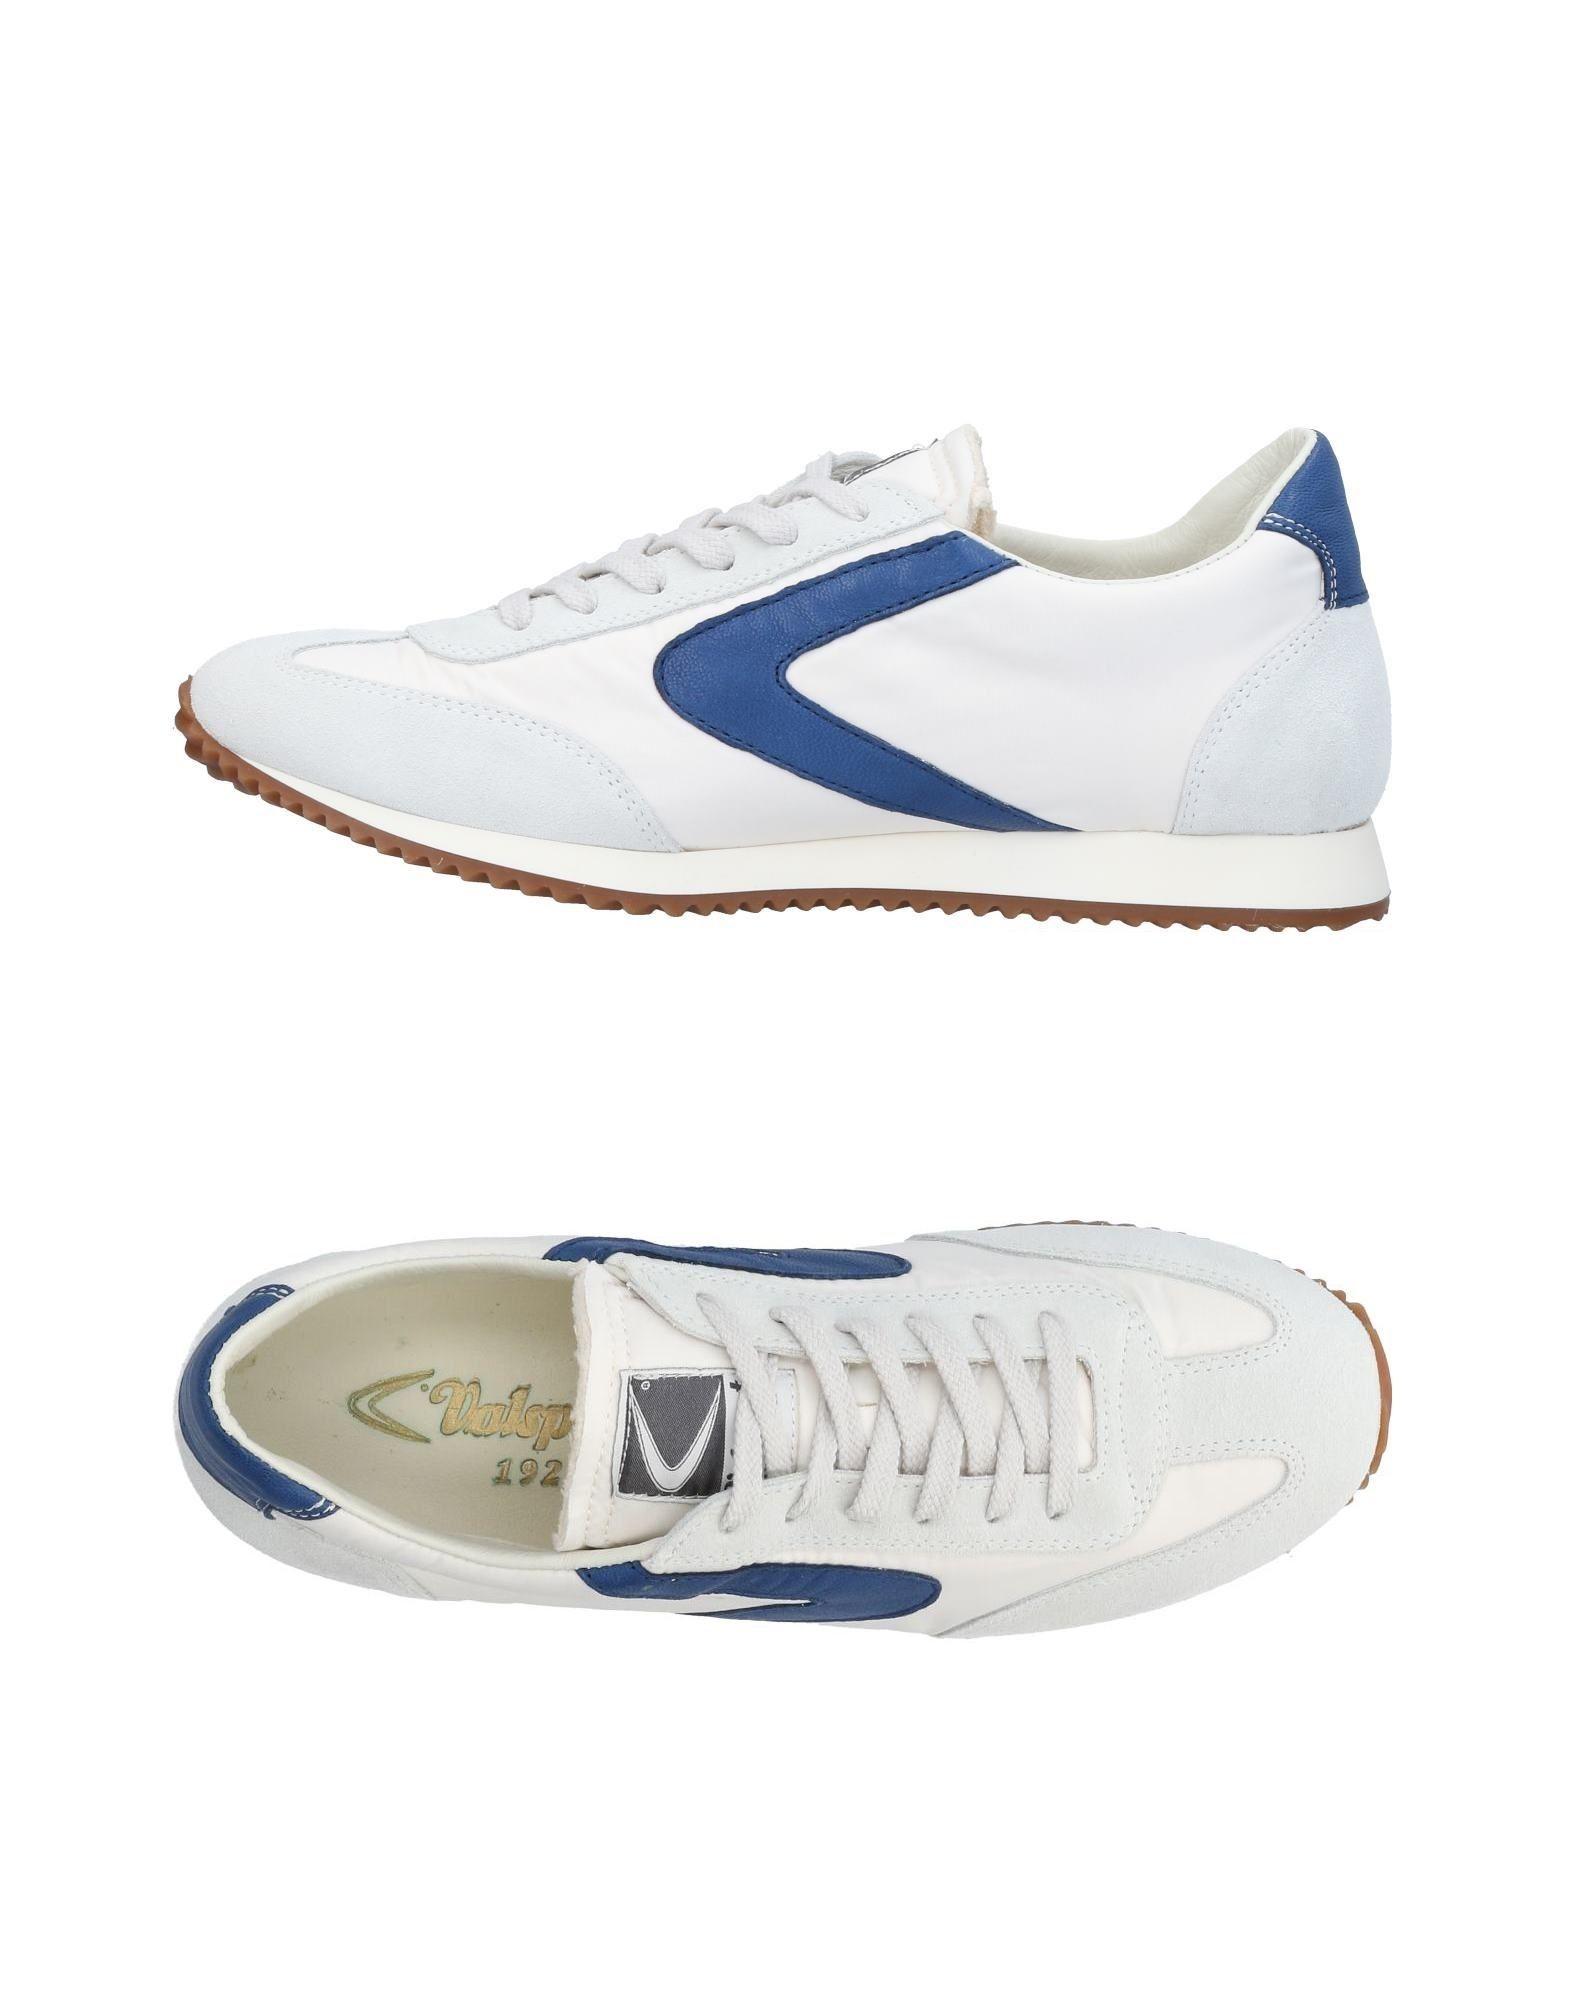 Sneakers Valsport Uomo - Acquista online su